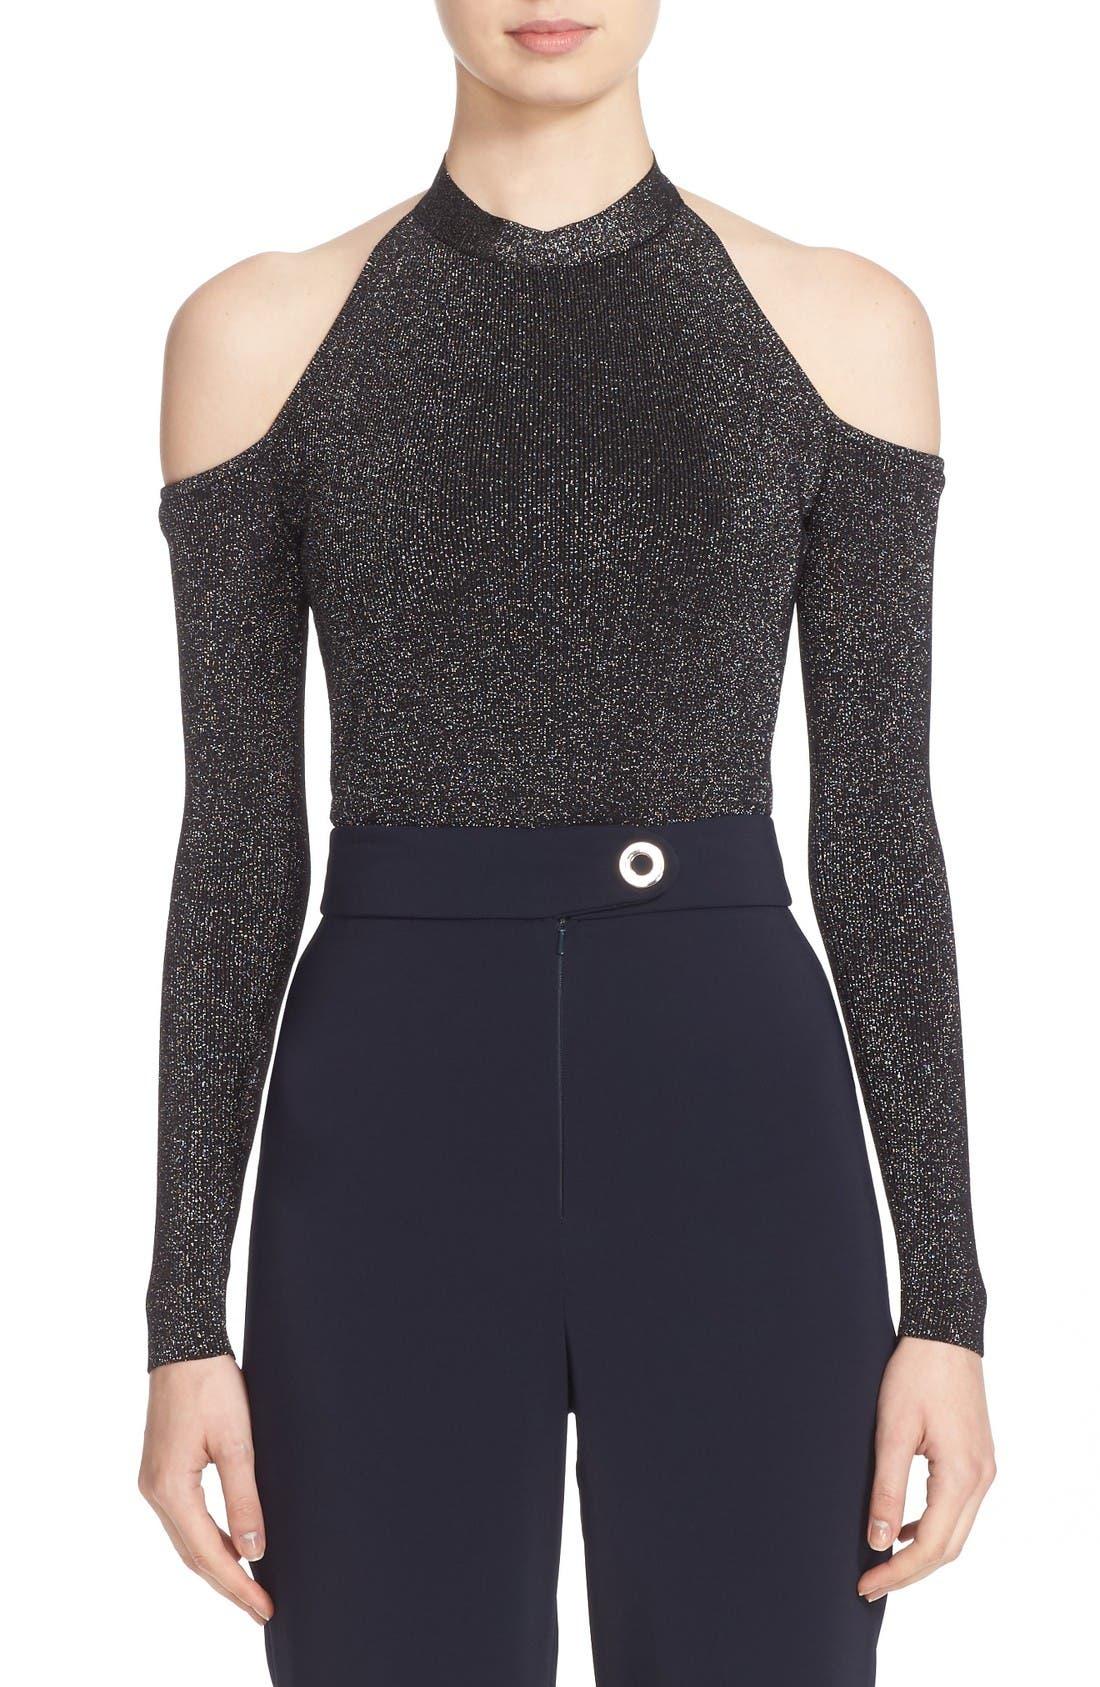 Cushnie et Ochs Knit Cold Shoulder Bodysuit